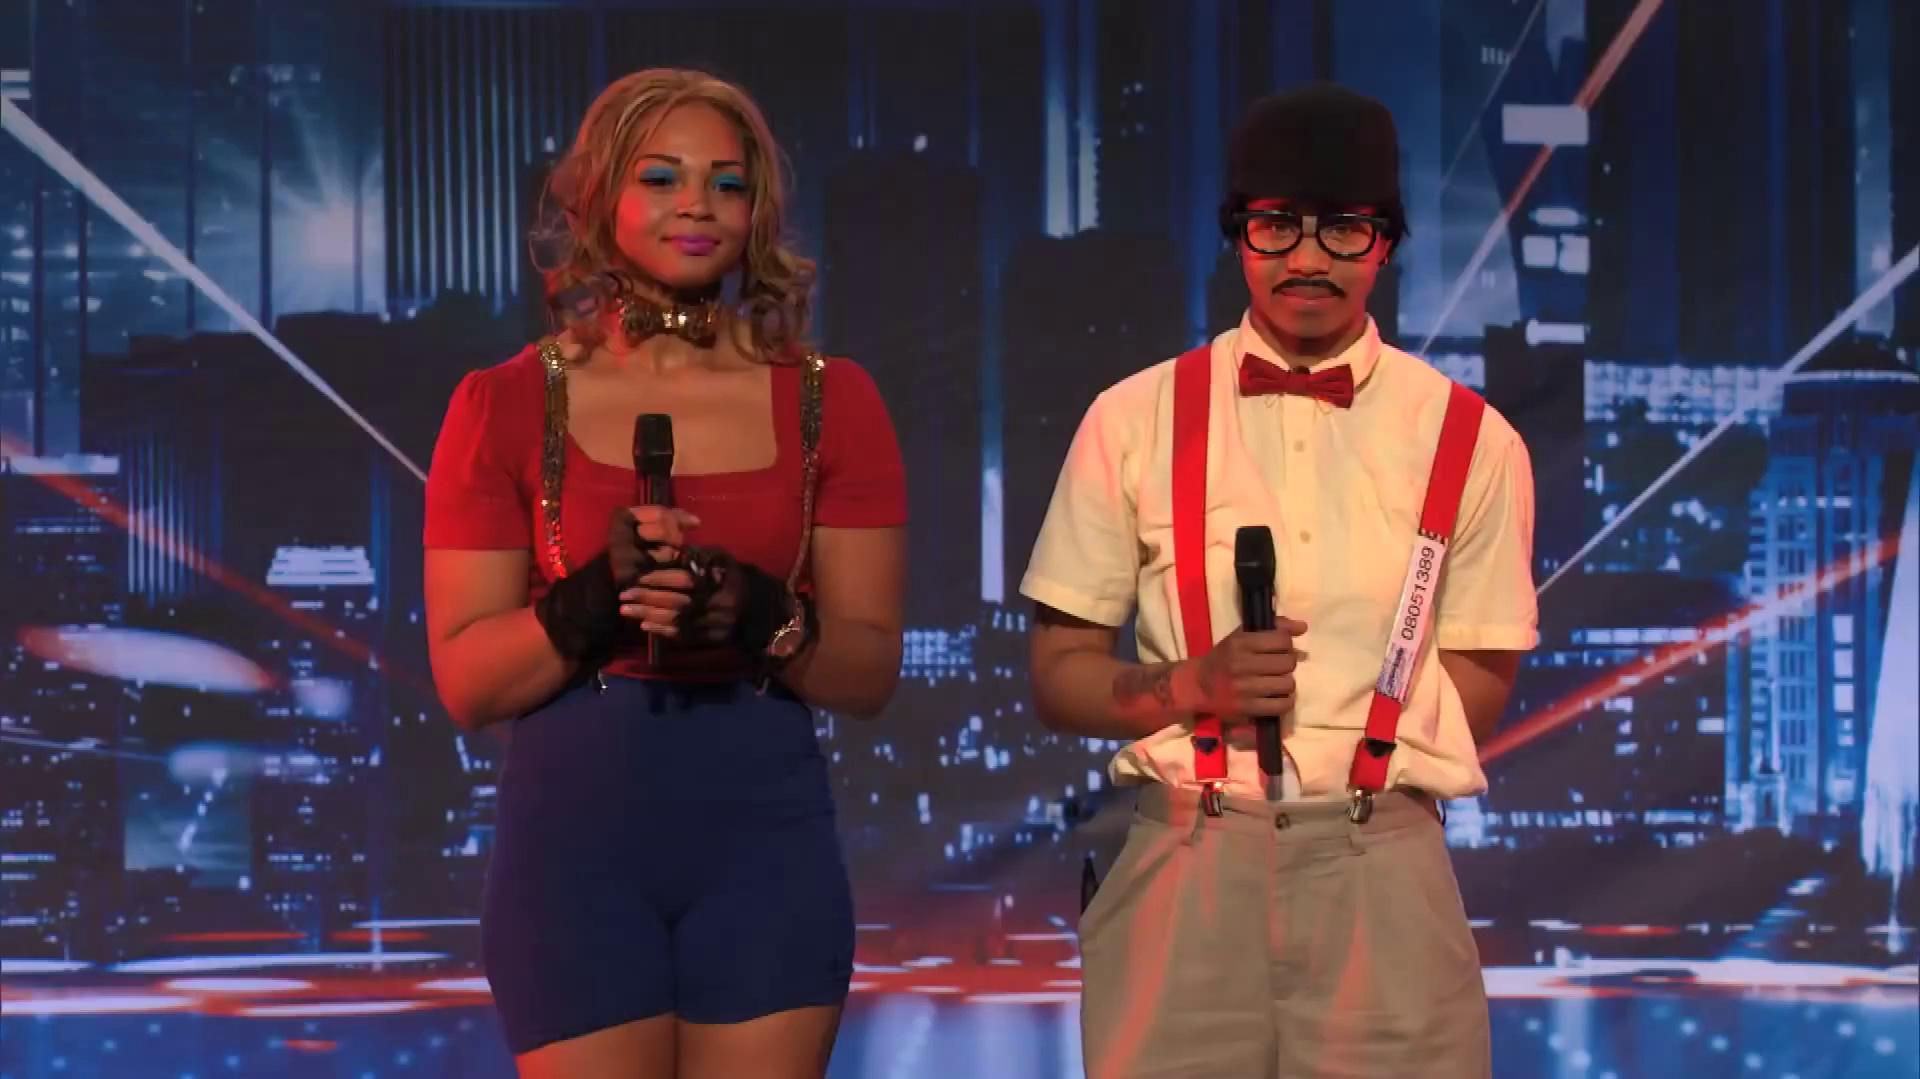 America's Got Talent 2013 - Season 8 - 102 - Distraxtion - Human Like Puppet Act